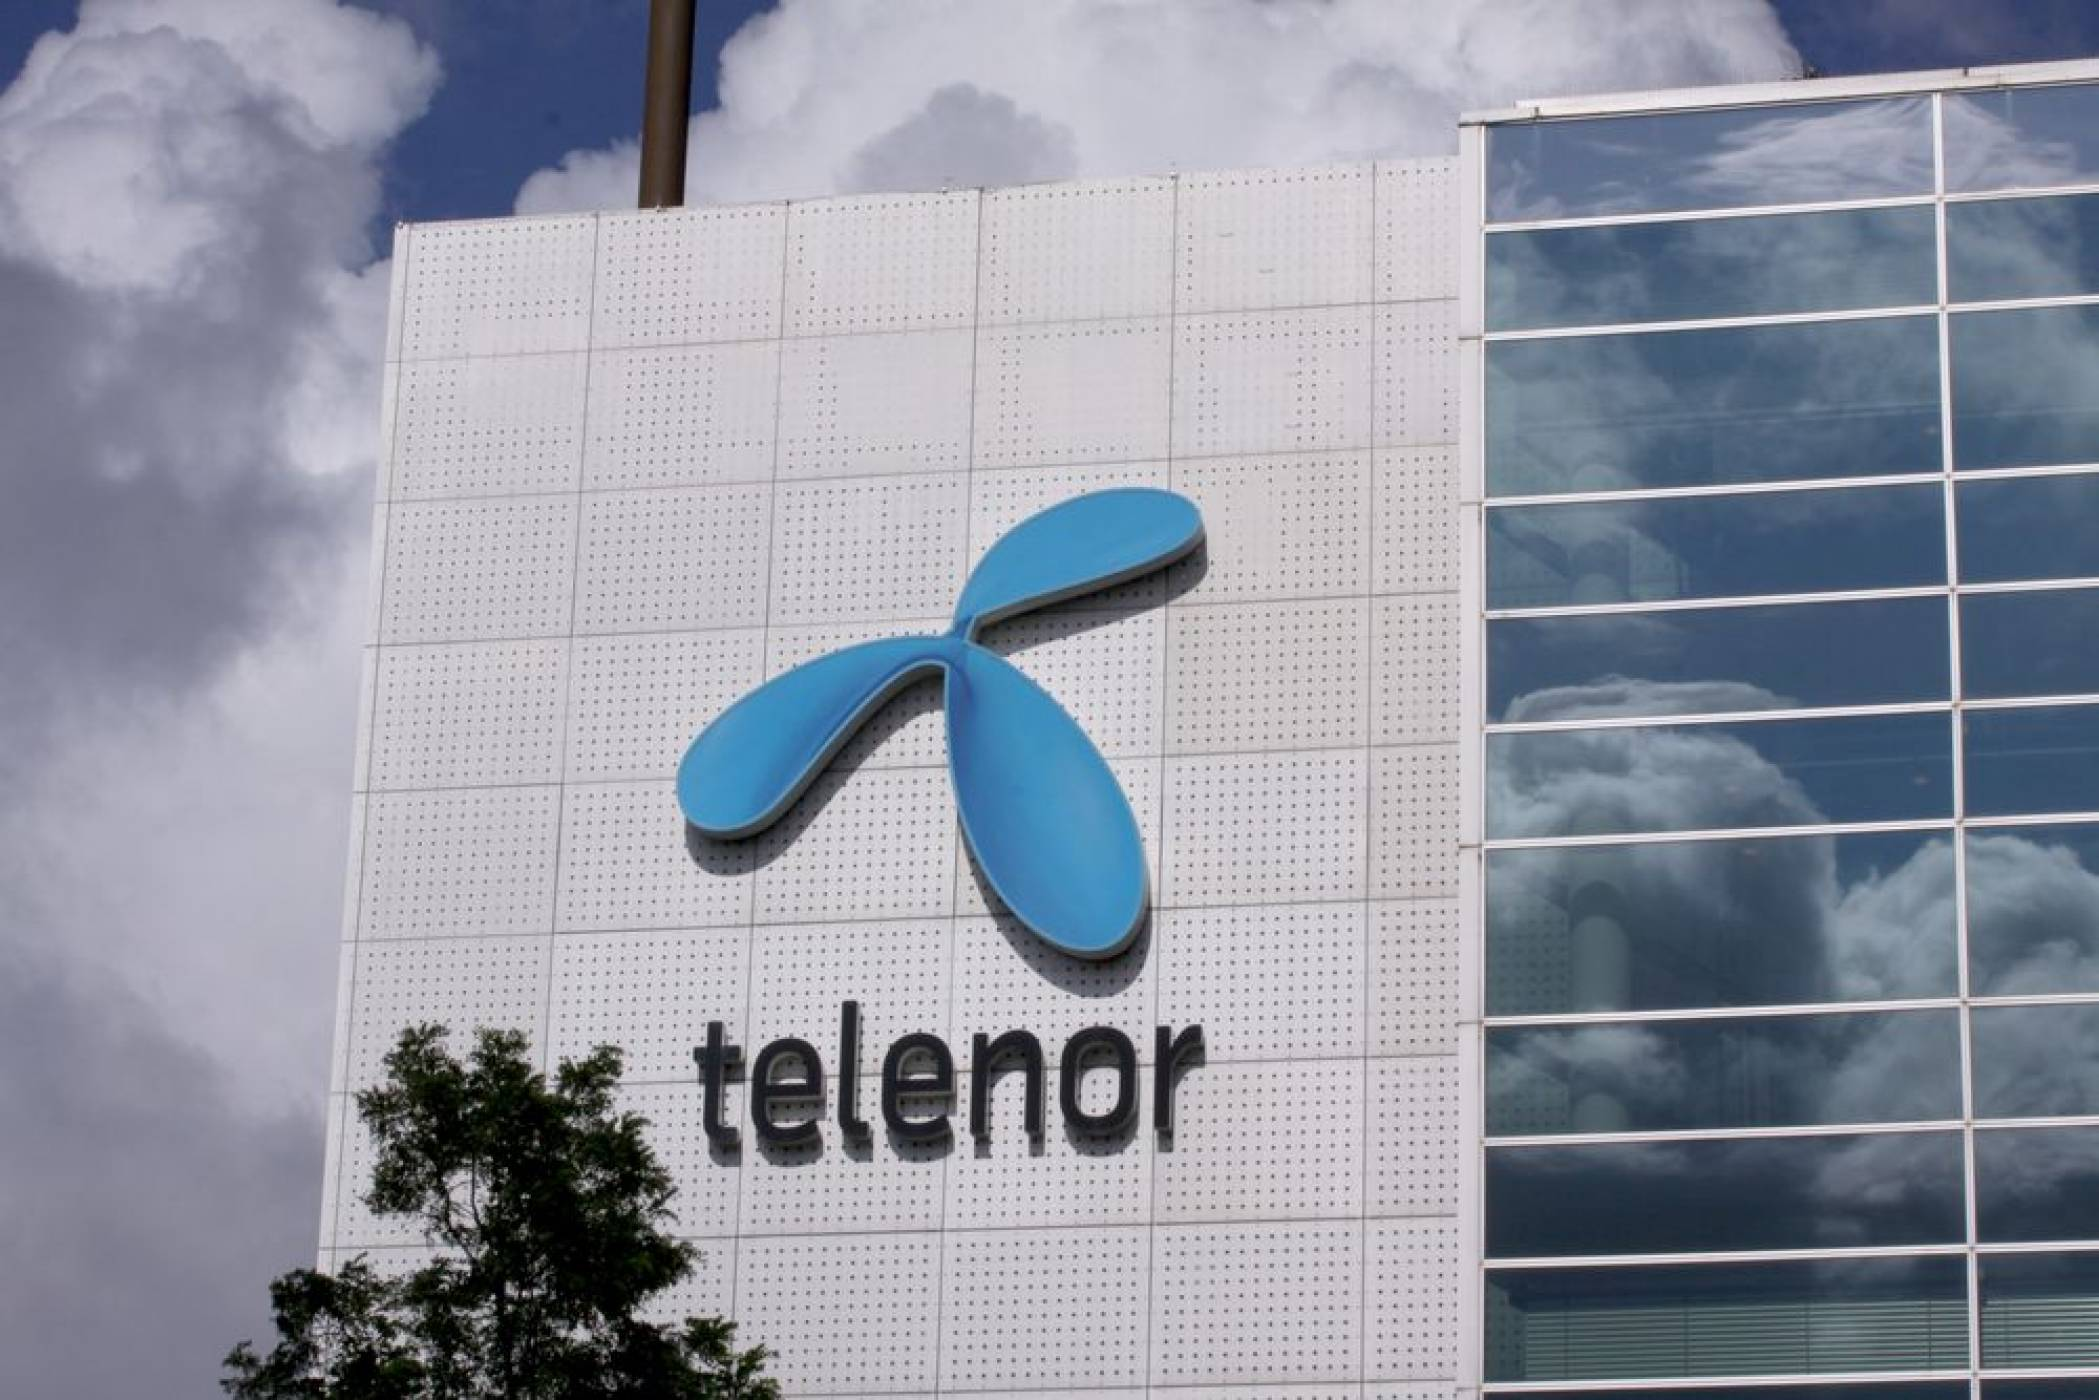 Telenor си остава Telenor... засега